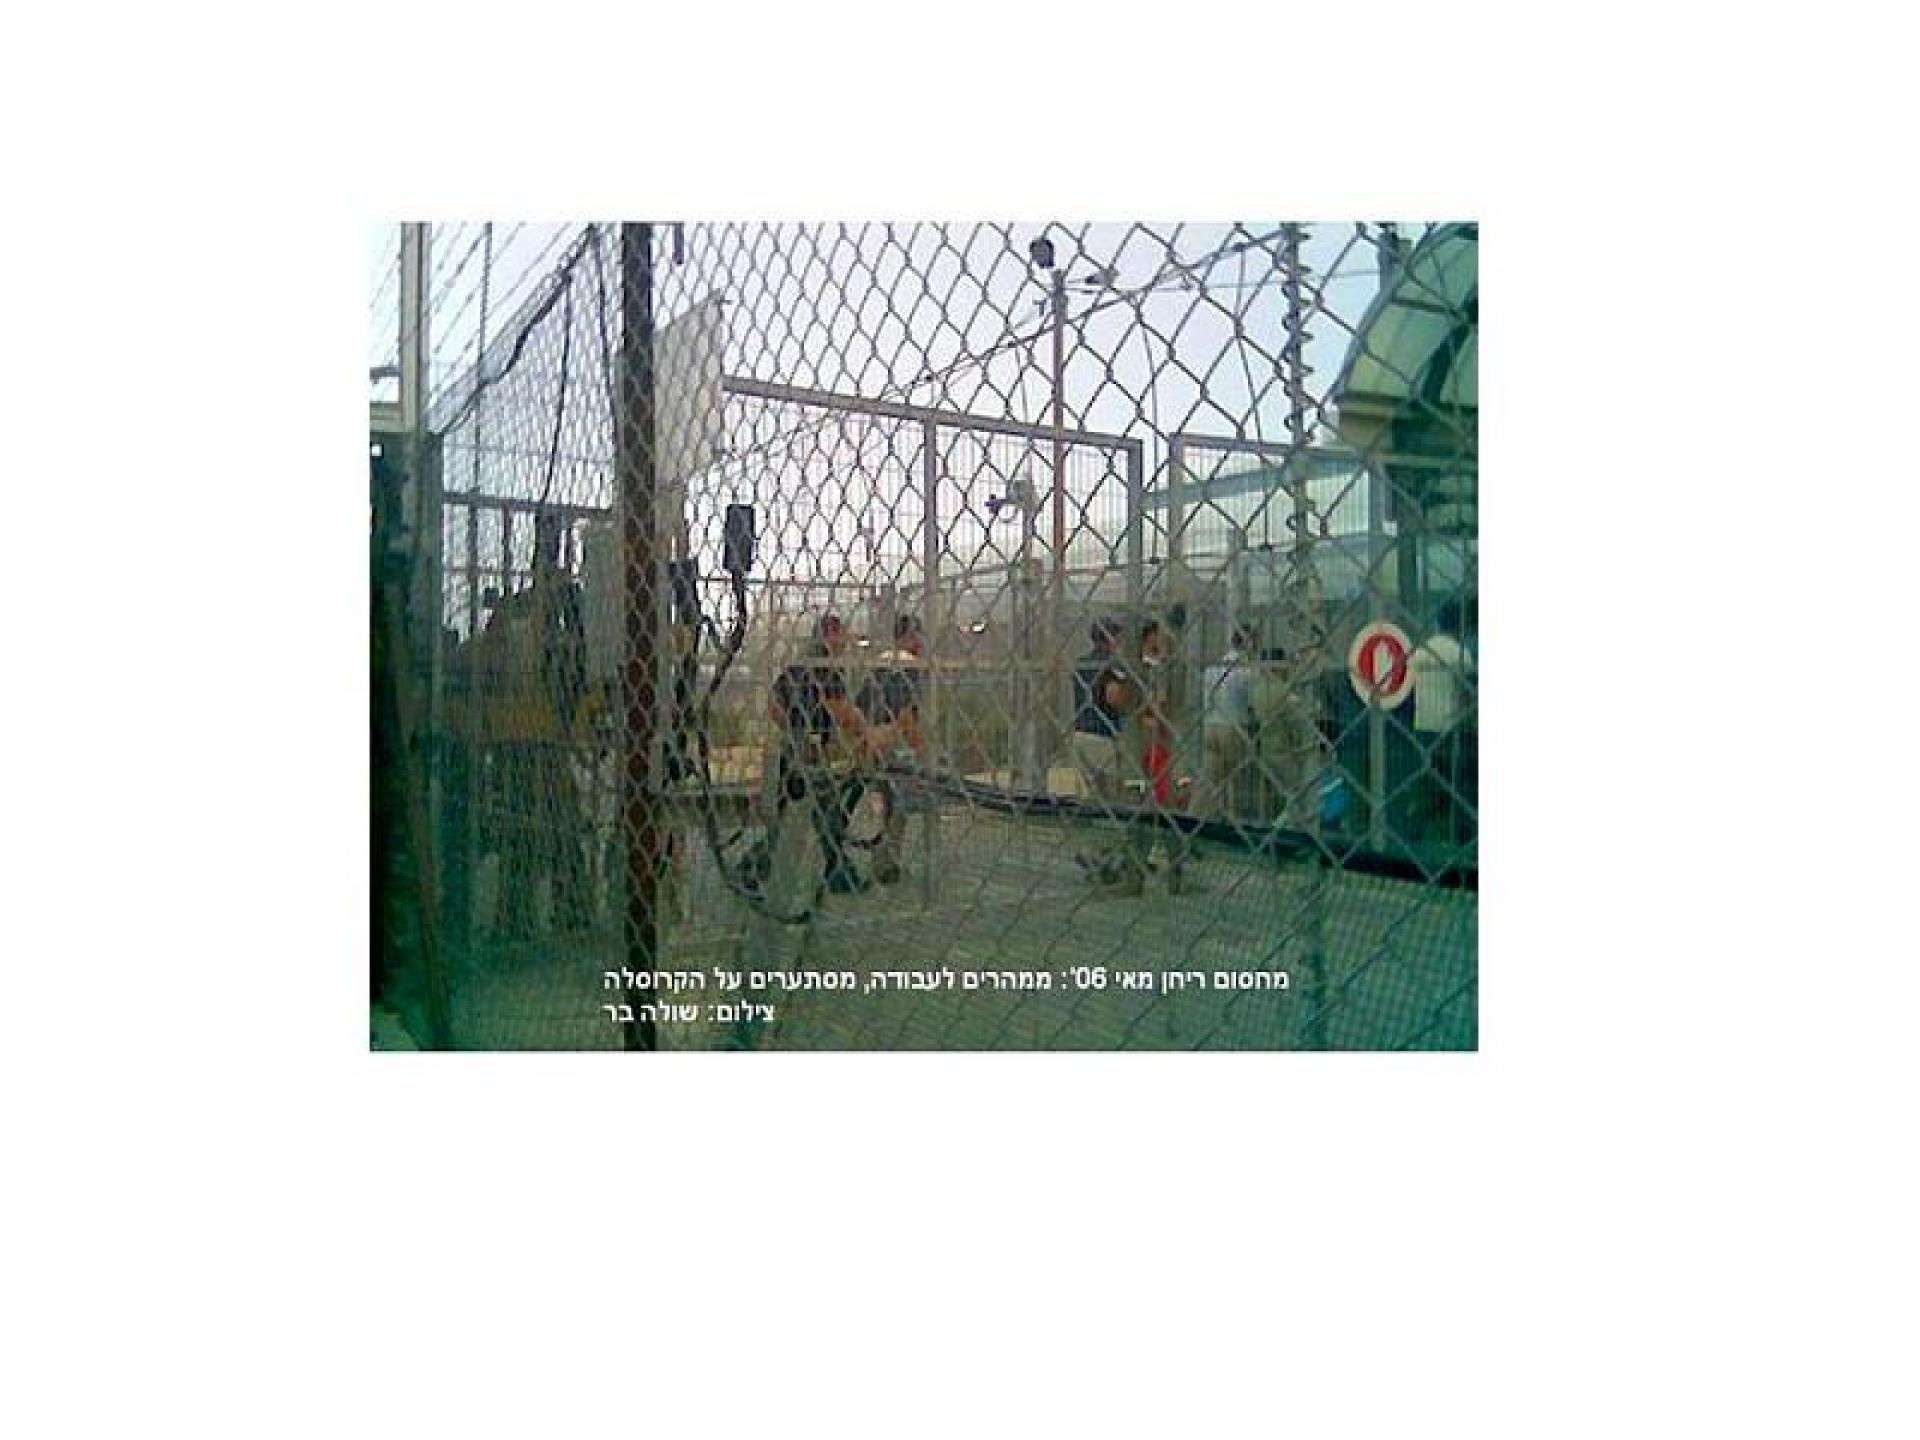 Barta'a/Reikhan checkpoint 15.05.06